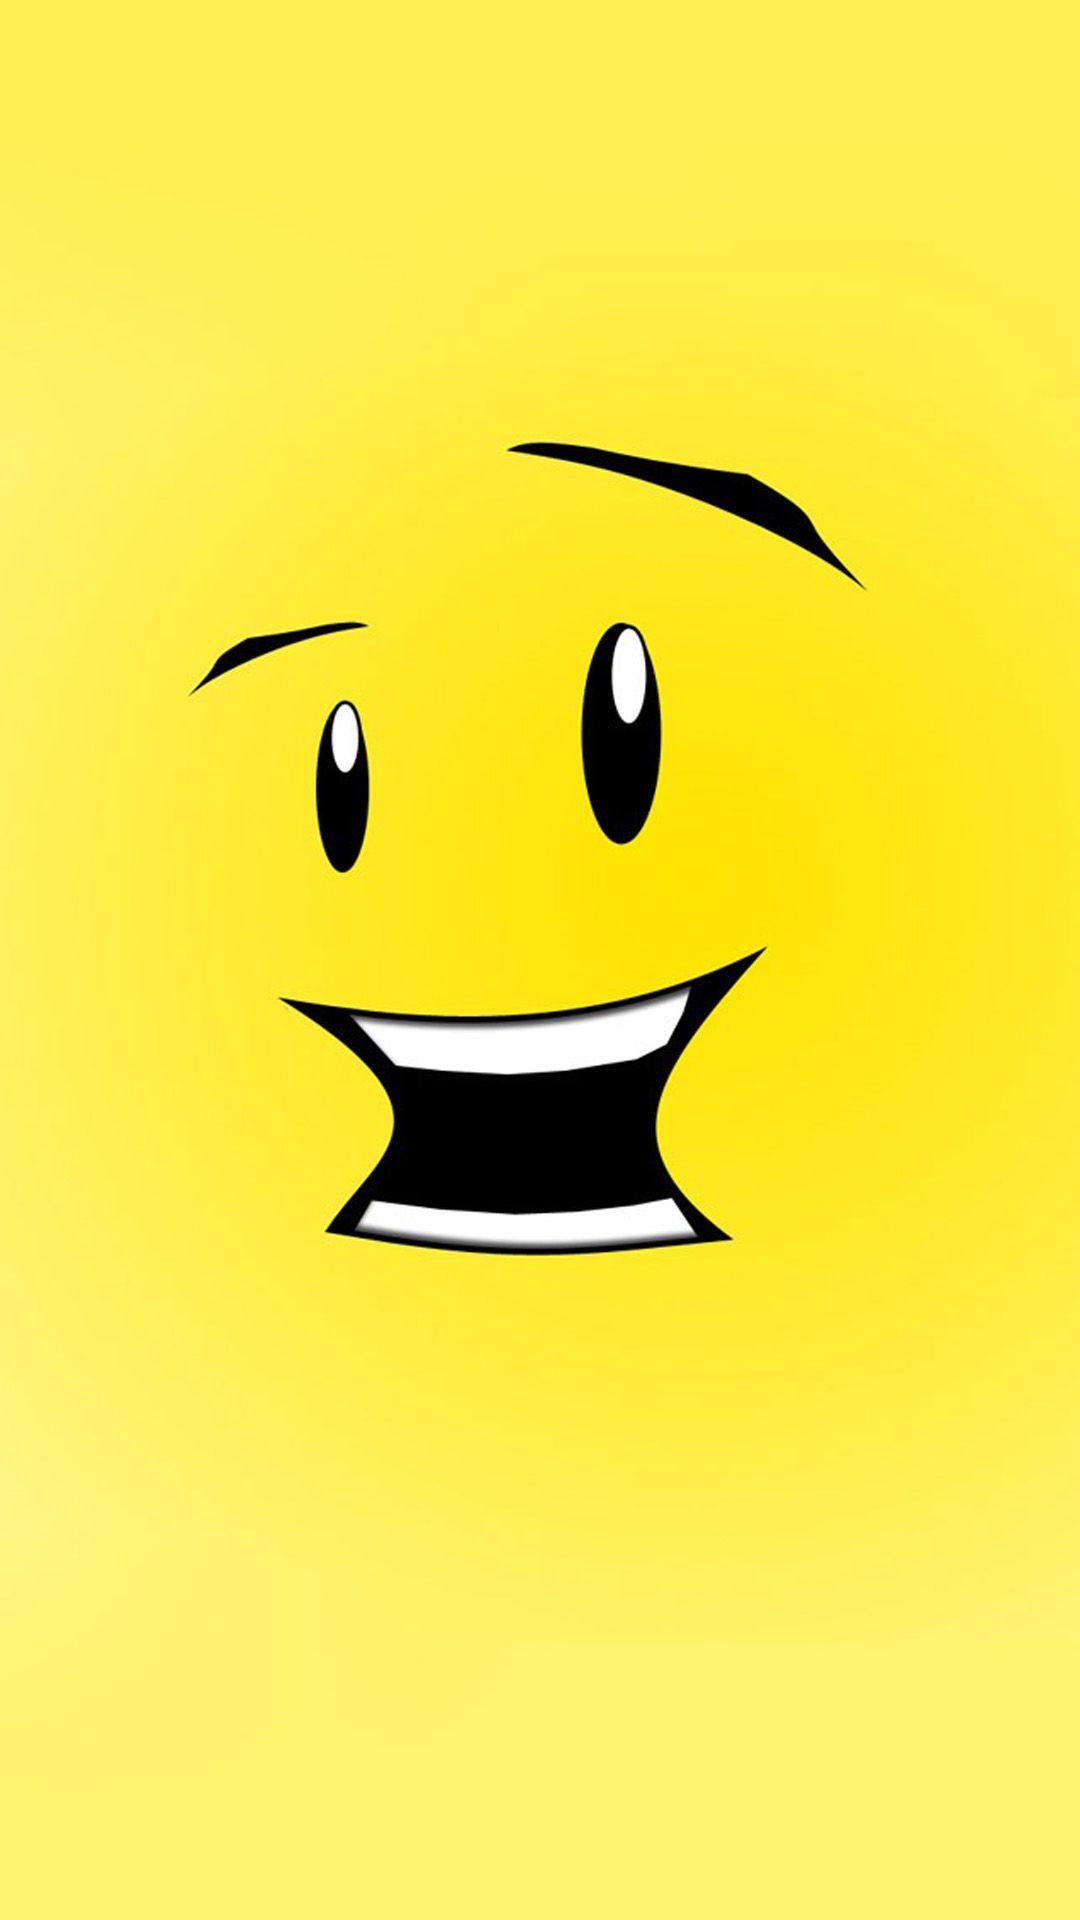 Cute Cartoon Smile Background iPhone 6 plus wallpaper